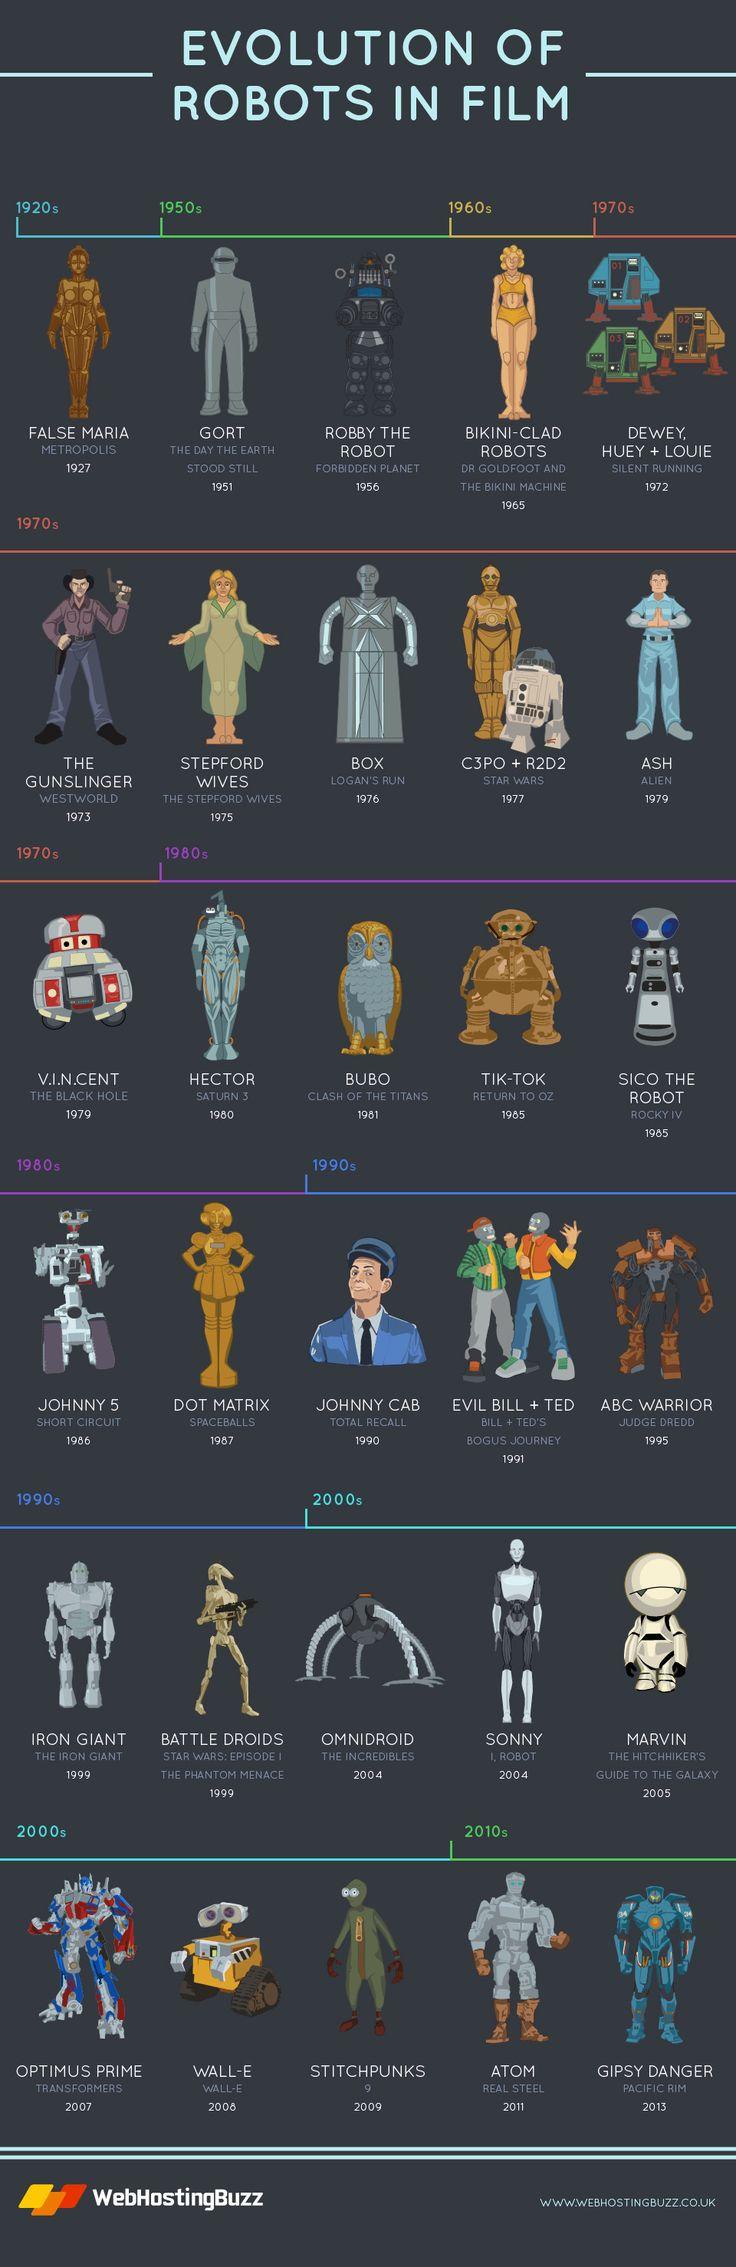 http://cdn.makeuseof.com/wp-content/uploads/2014/12/Evolution-of-Robots-in-Film1.jpg?82548d